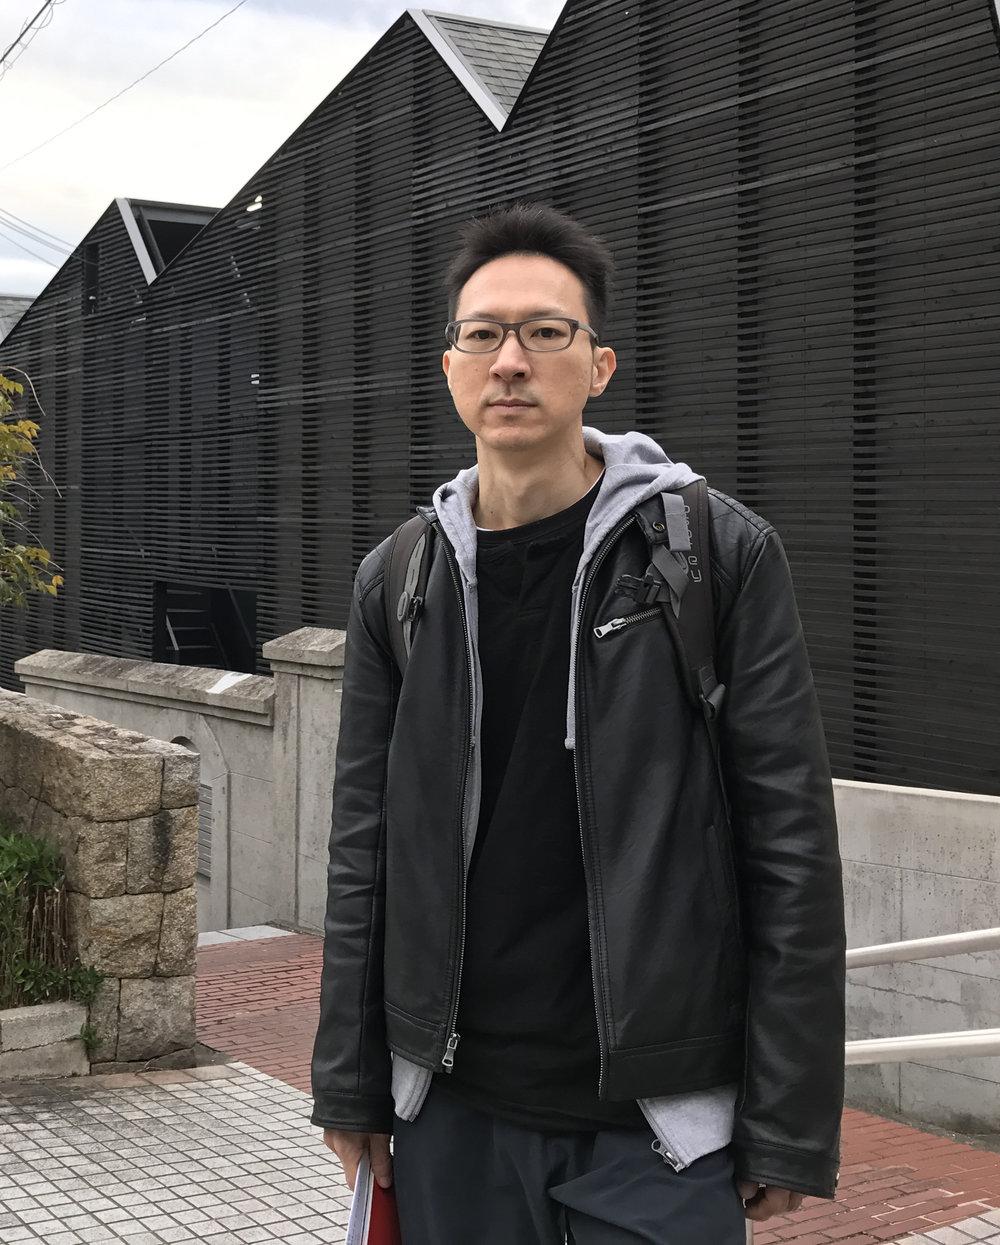 Deok-jae JEONGHUH (South Korea)